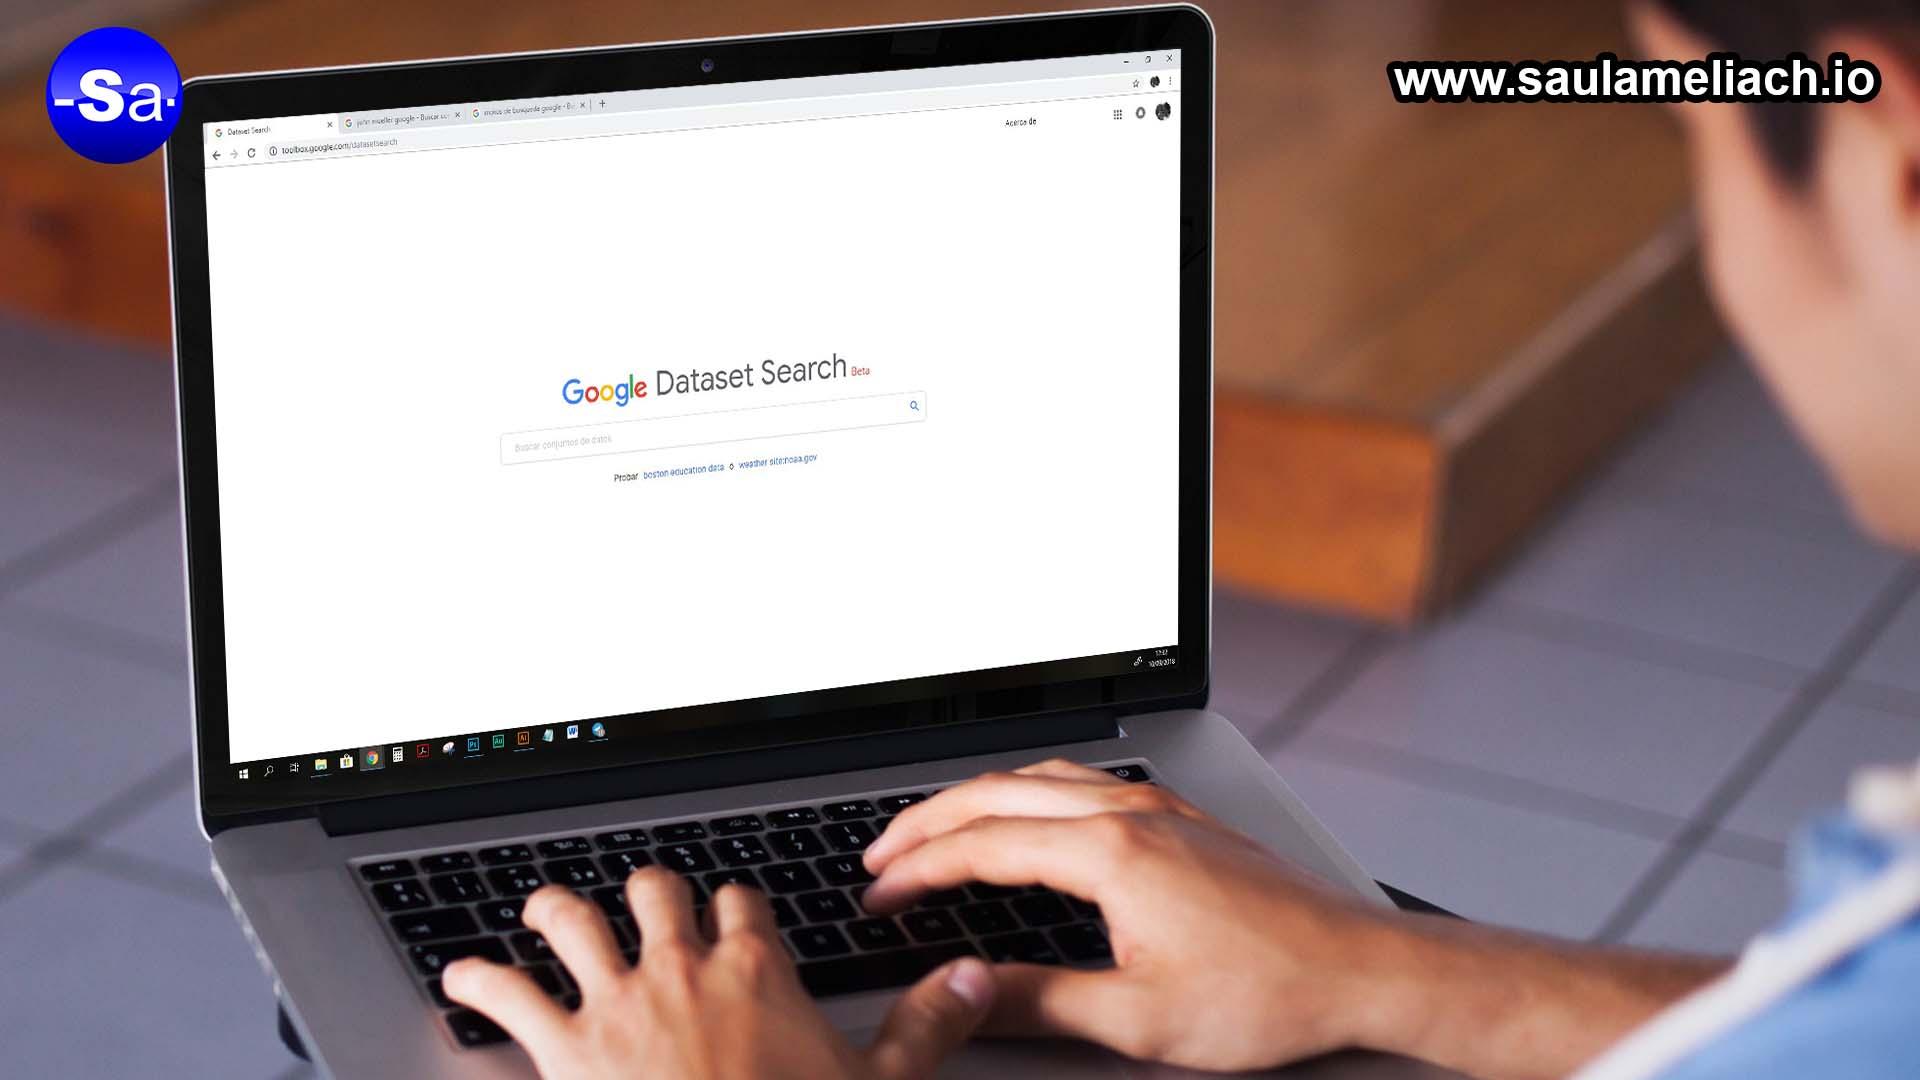 google - dataset search - saul ameliach